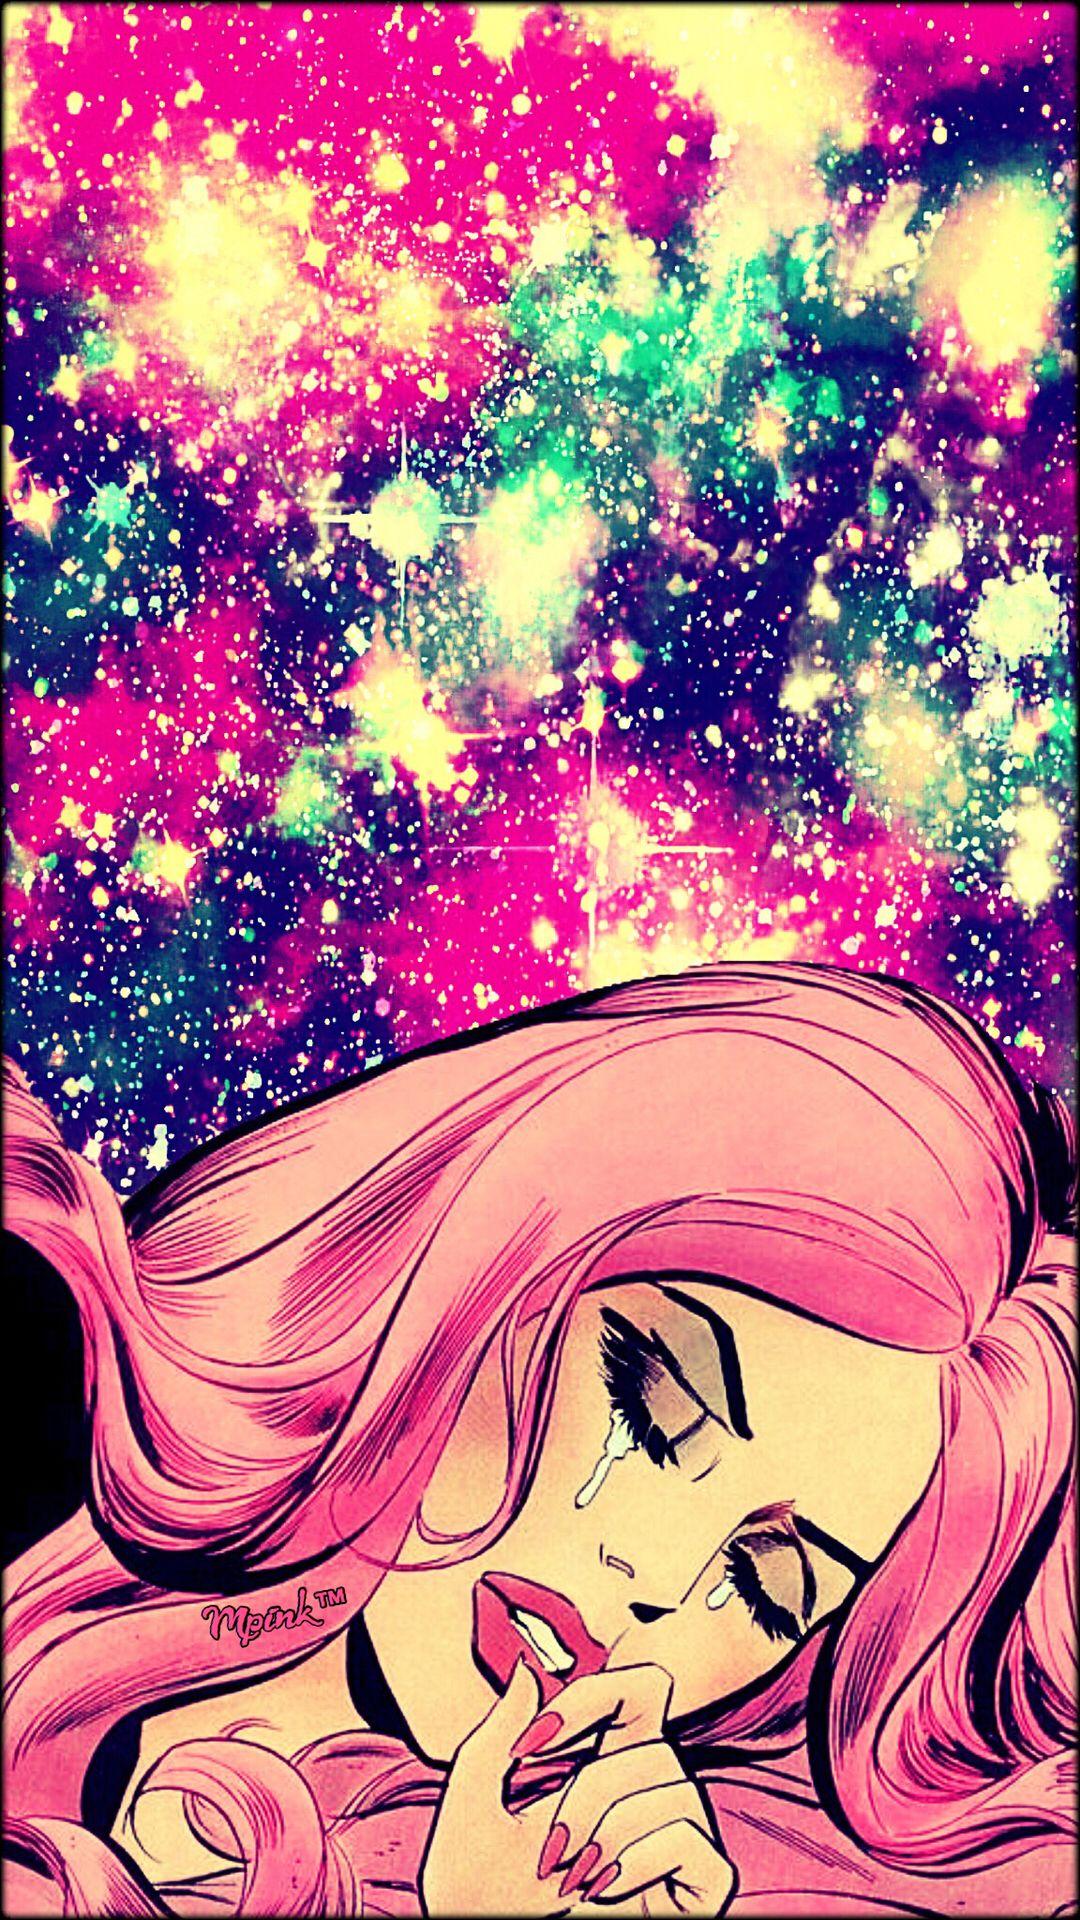 Sad girl galaxy wallpaper androidwallpaper iphonewallpaper wallpaper galaxy sparkle - Galaxy wallpaper for girls ...